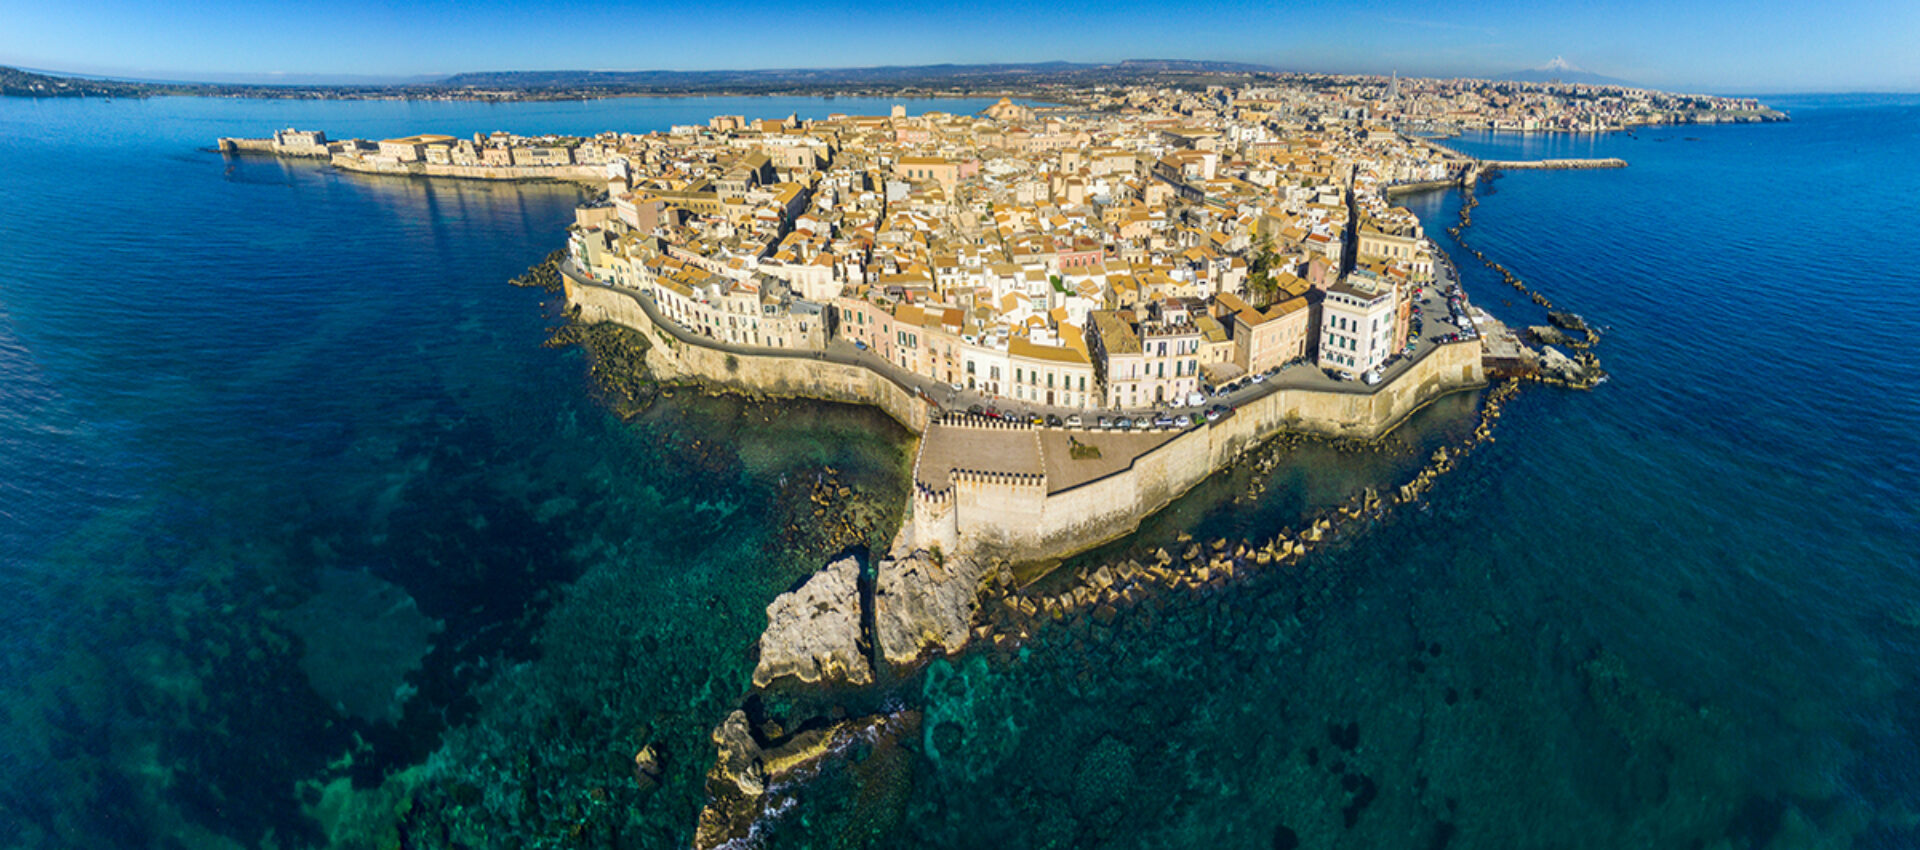 Siracusa e Ortigia, un'eterna storia d'amore!